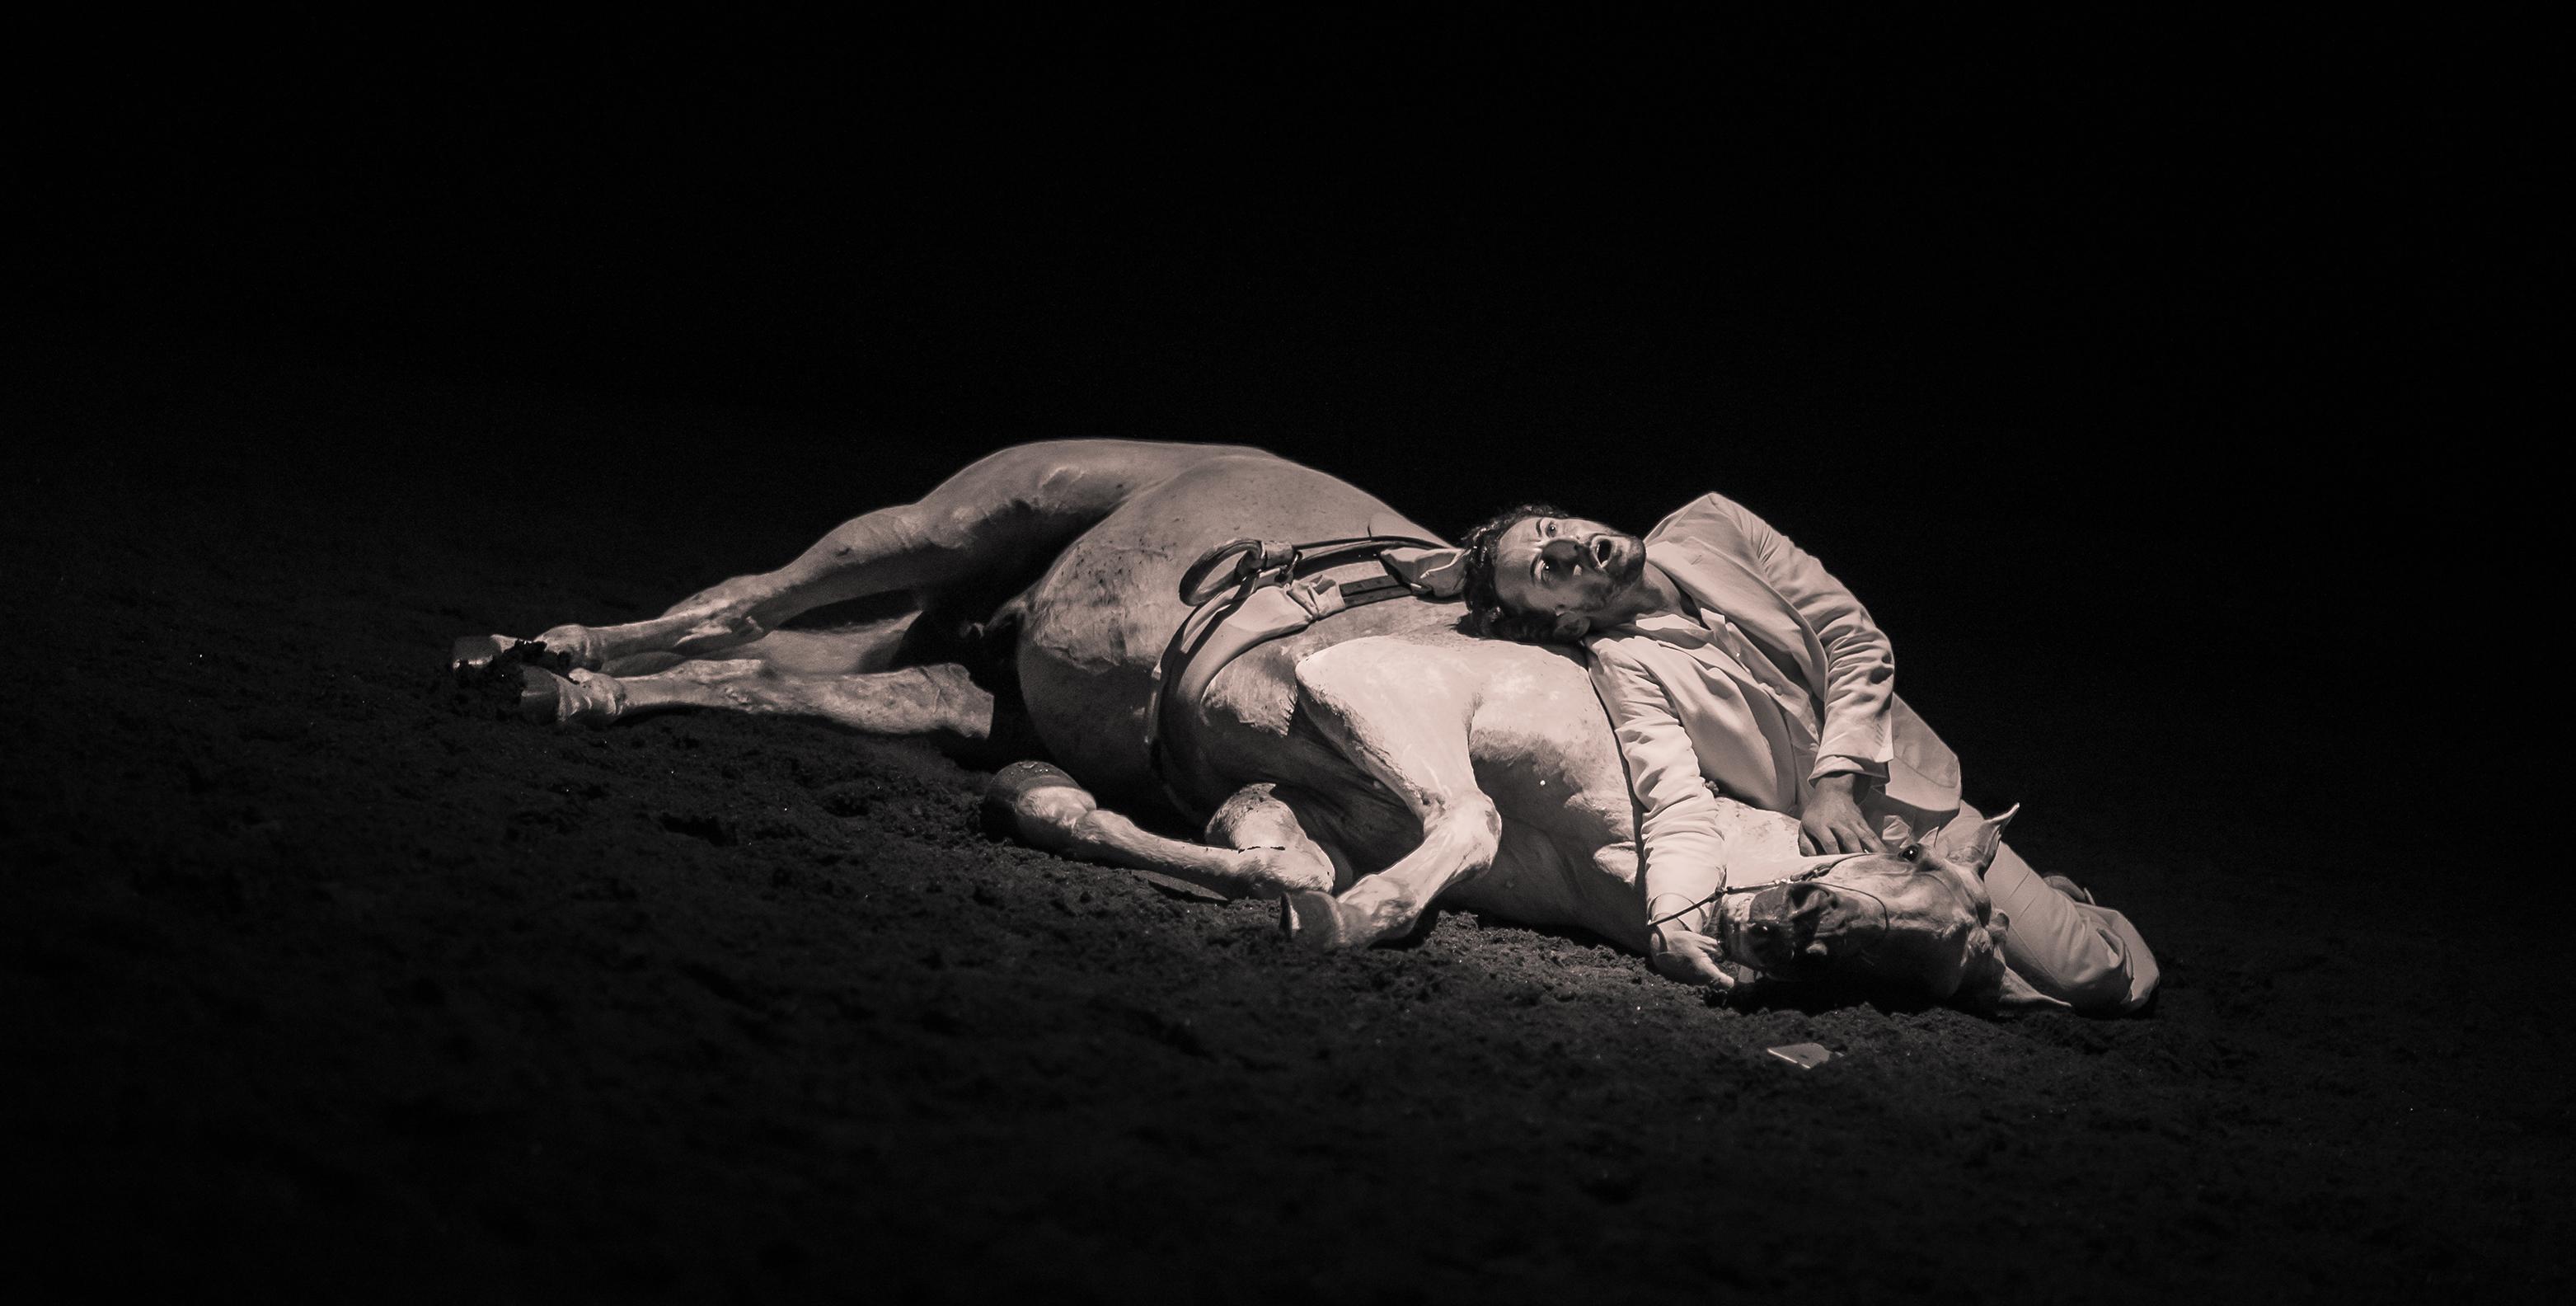 214-centaure_7vaguehd-61_philippe_metsu_-_ubik_photo